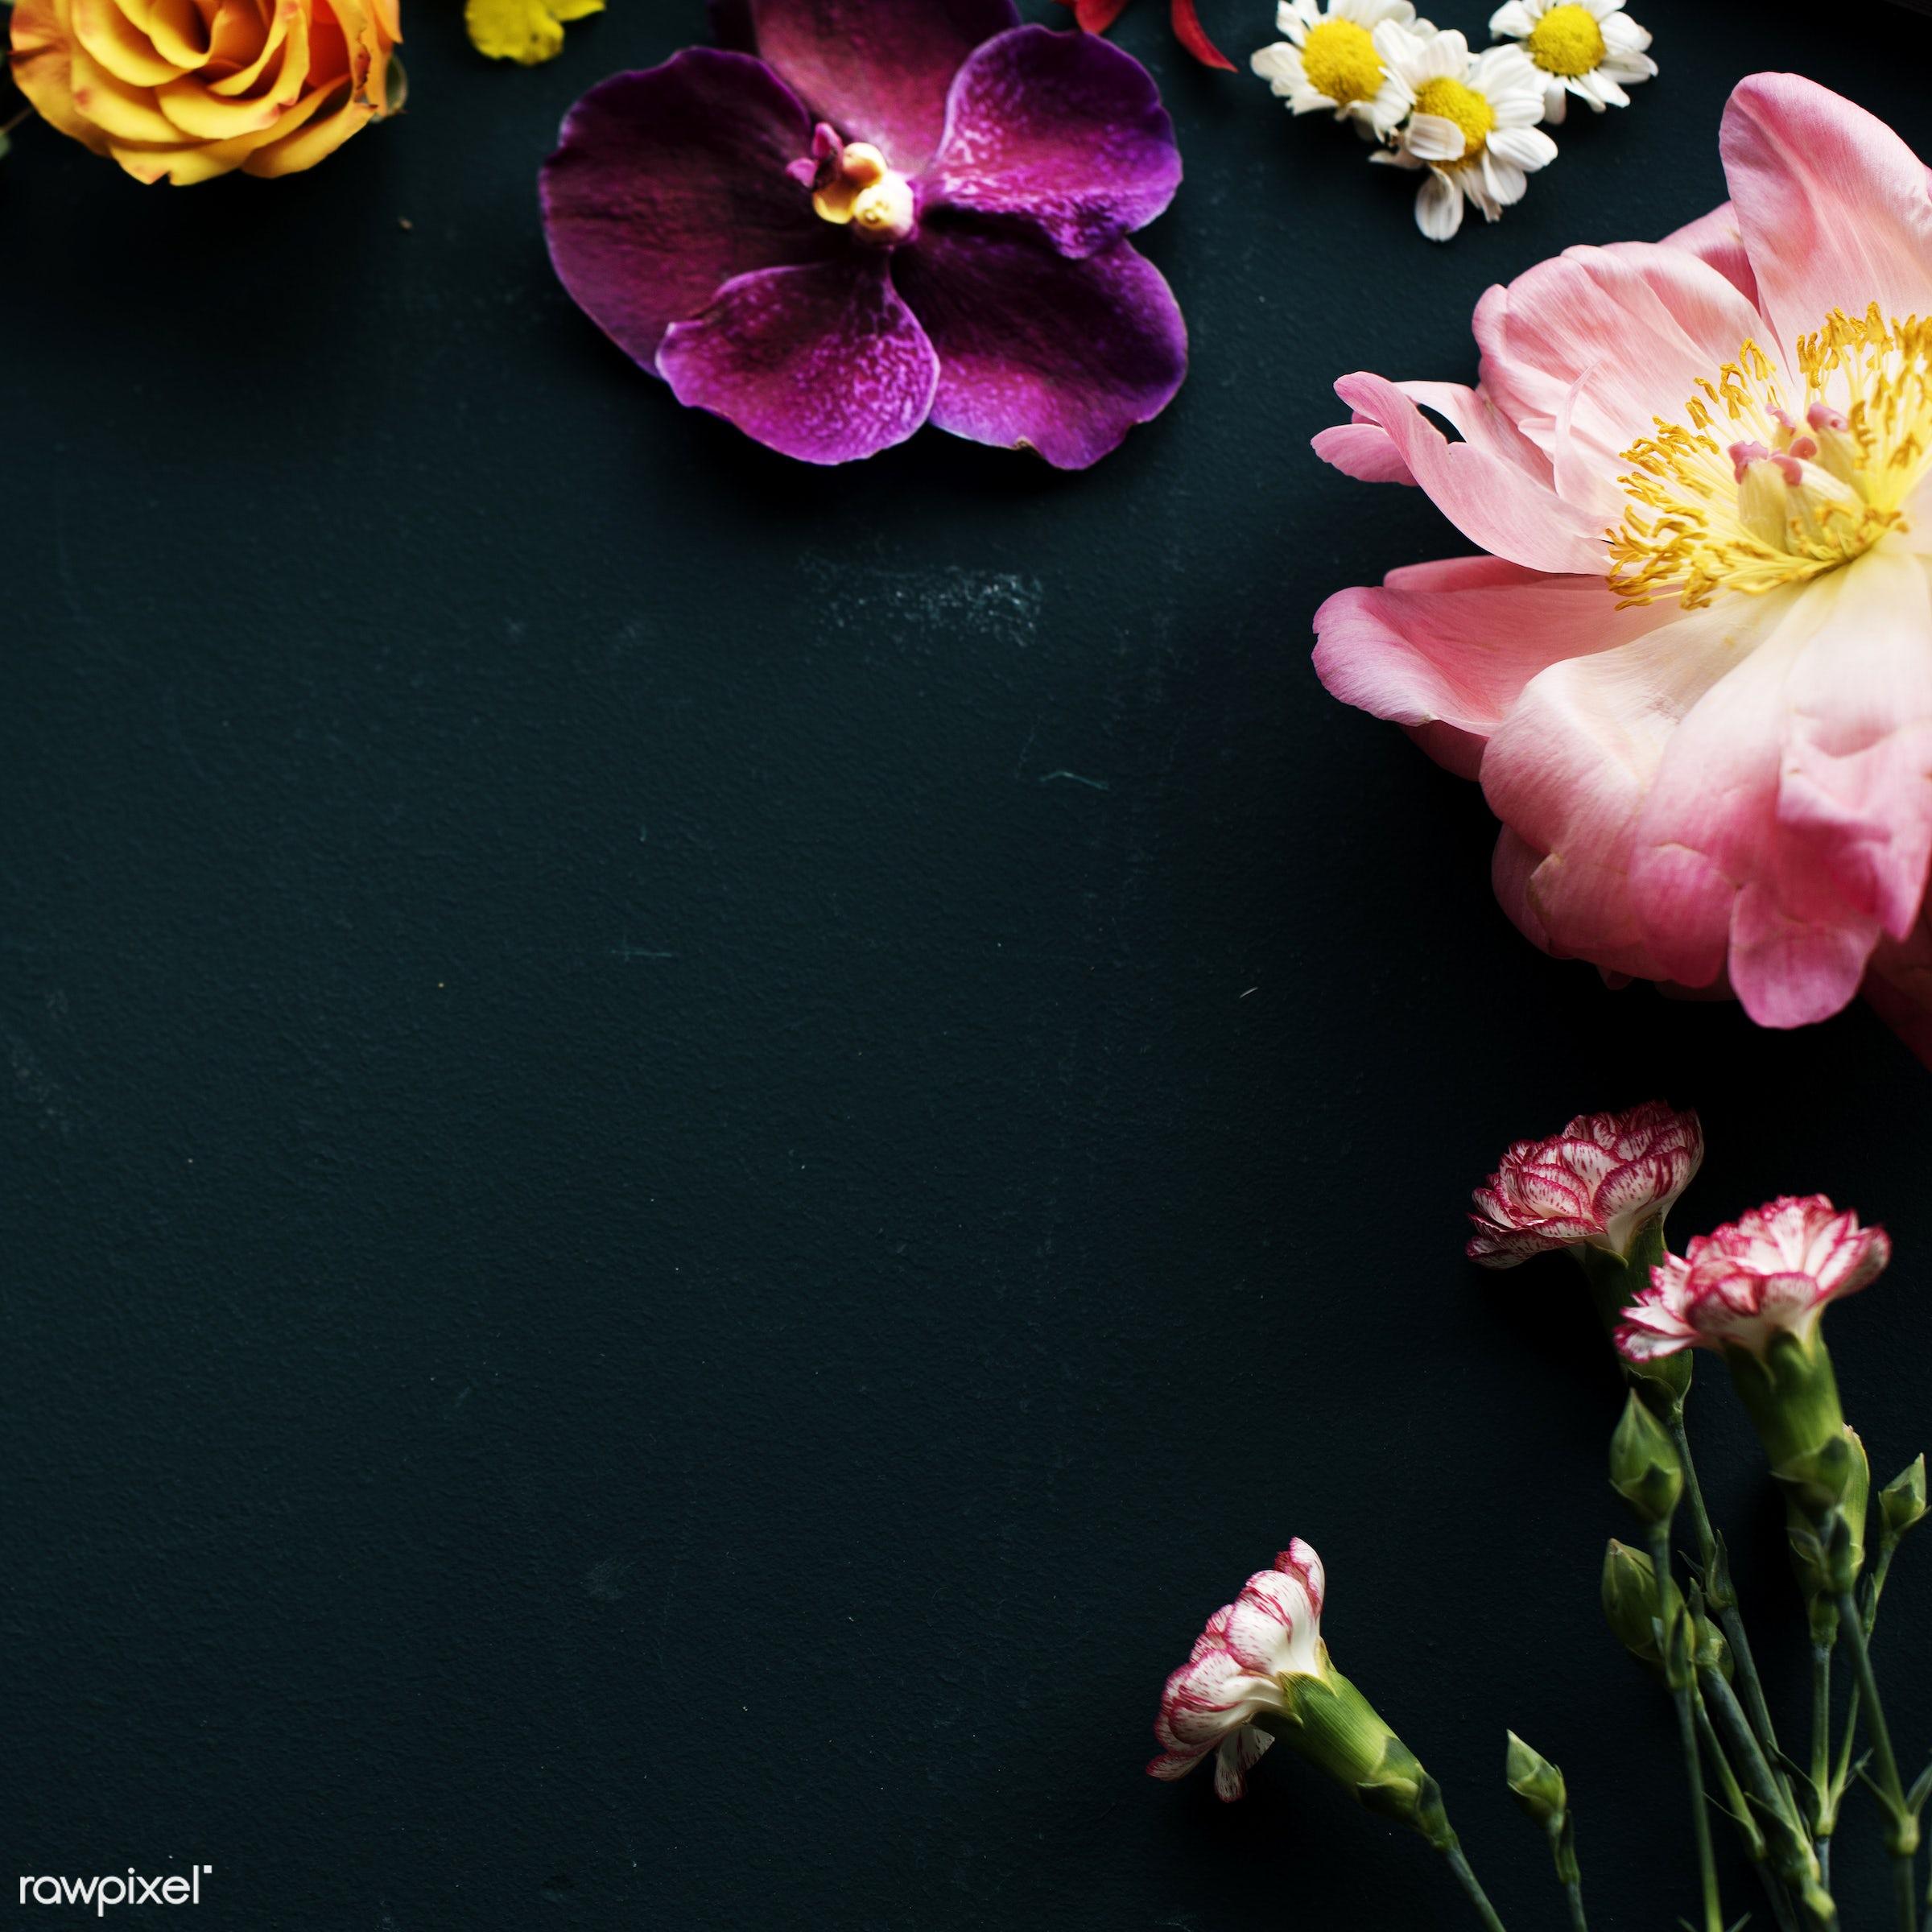 plant, copy space, blank, decoration, flora, refreshment, leisure, florist, recreational, fresh, natural, flower